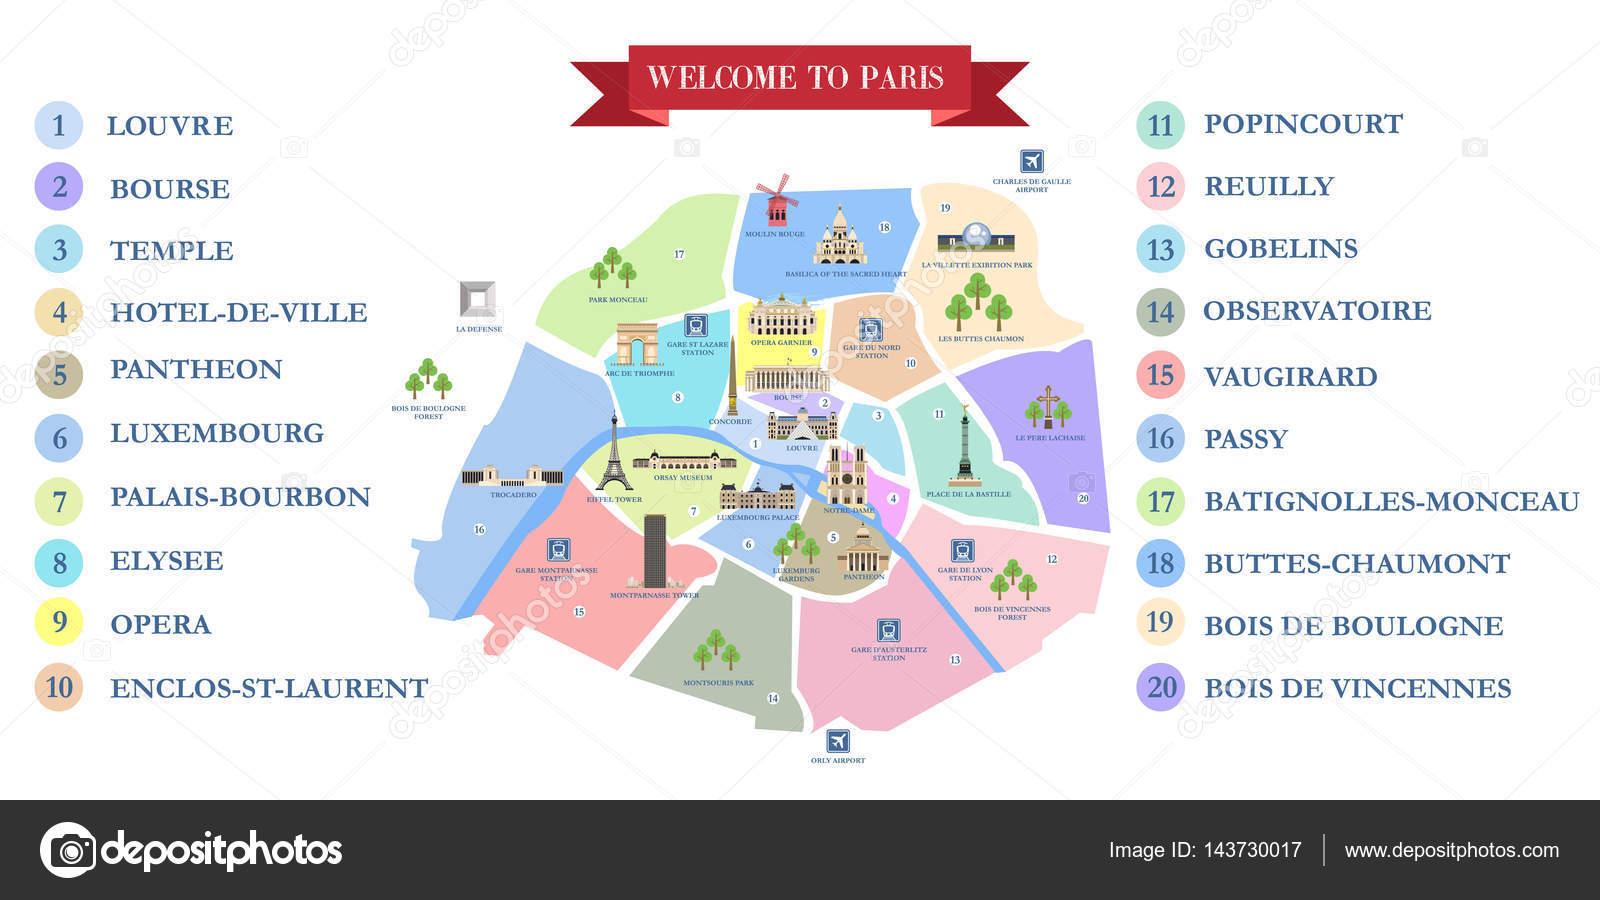 Karta Over Paris Sevardheter Karta 2020